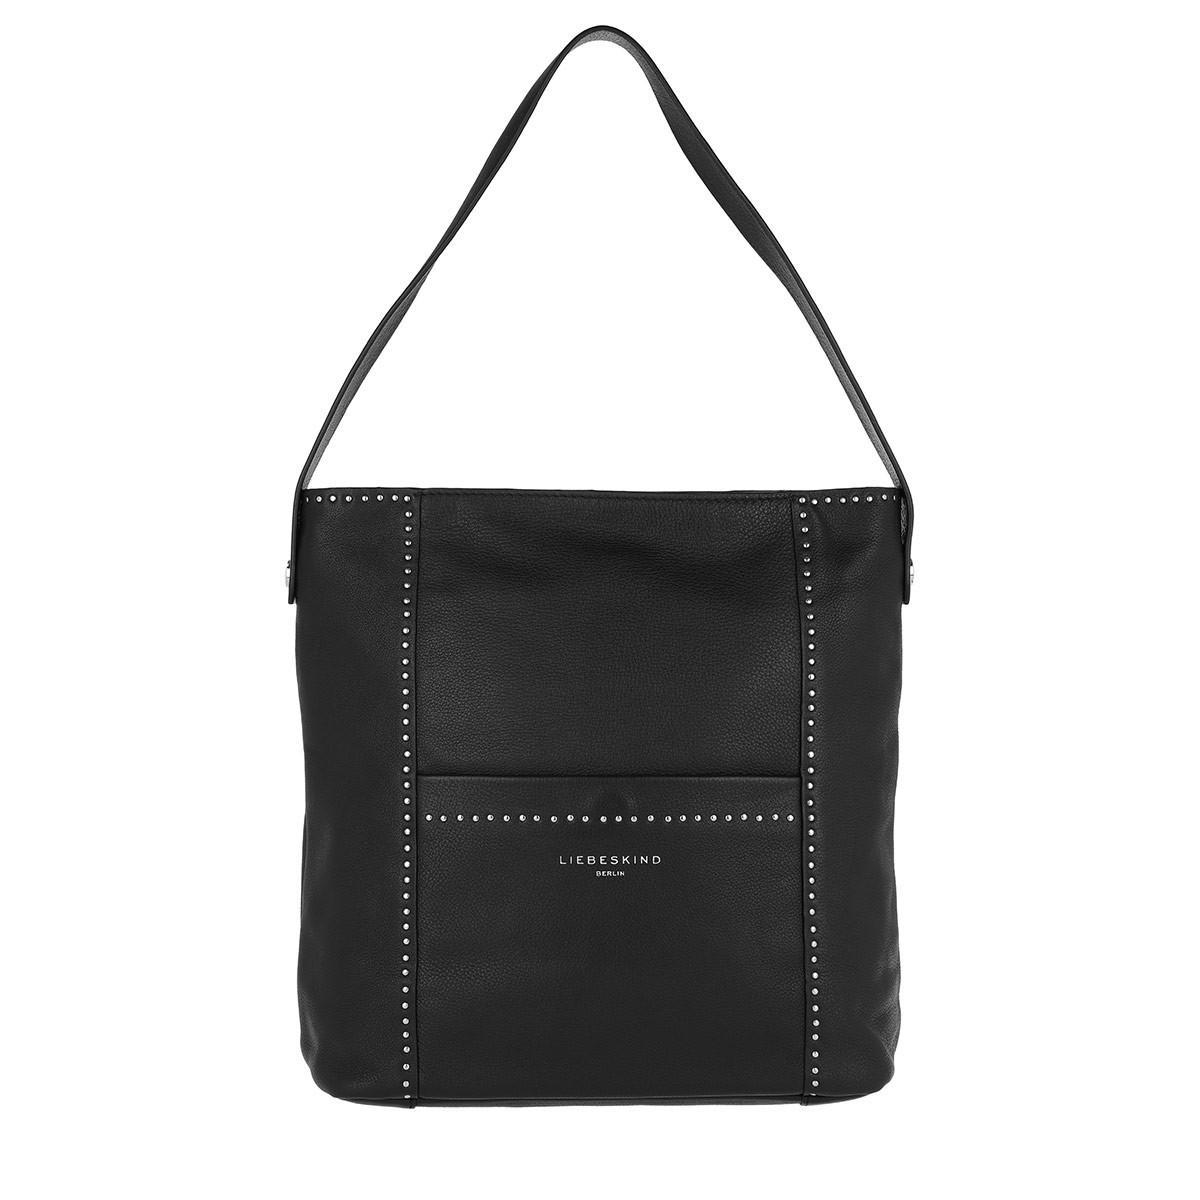 dd81647e0bc8 Liebeskind Berlin - Vintage Stud Love Hobo Bag Medium Black - Lyst. View  fullscreen